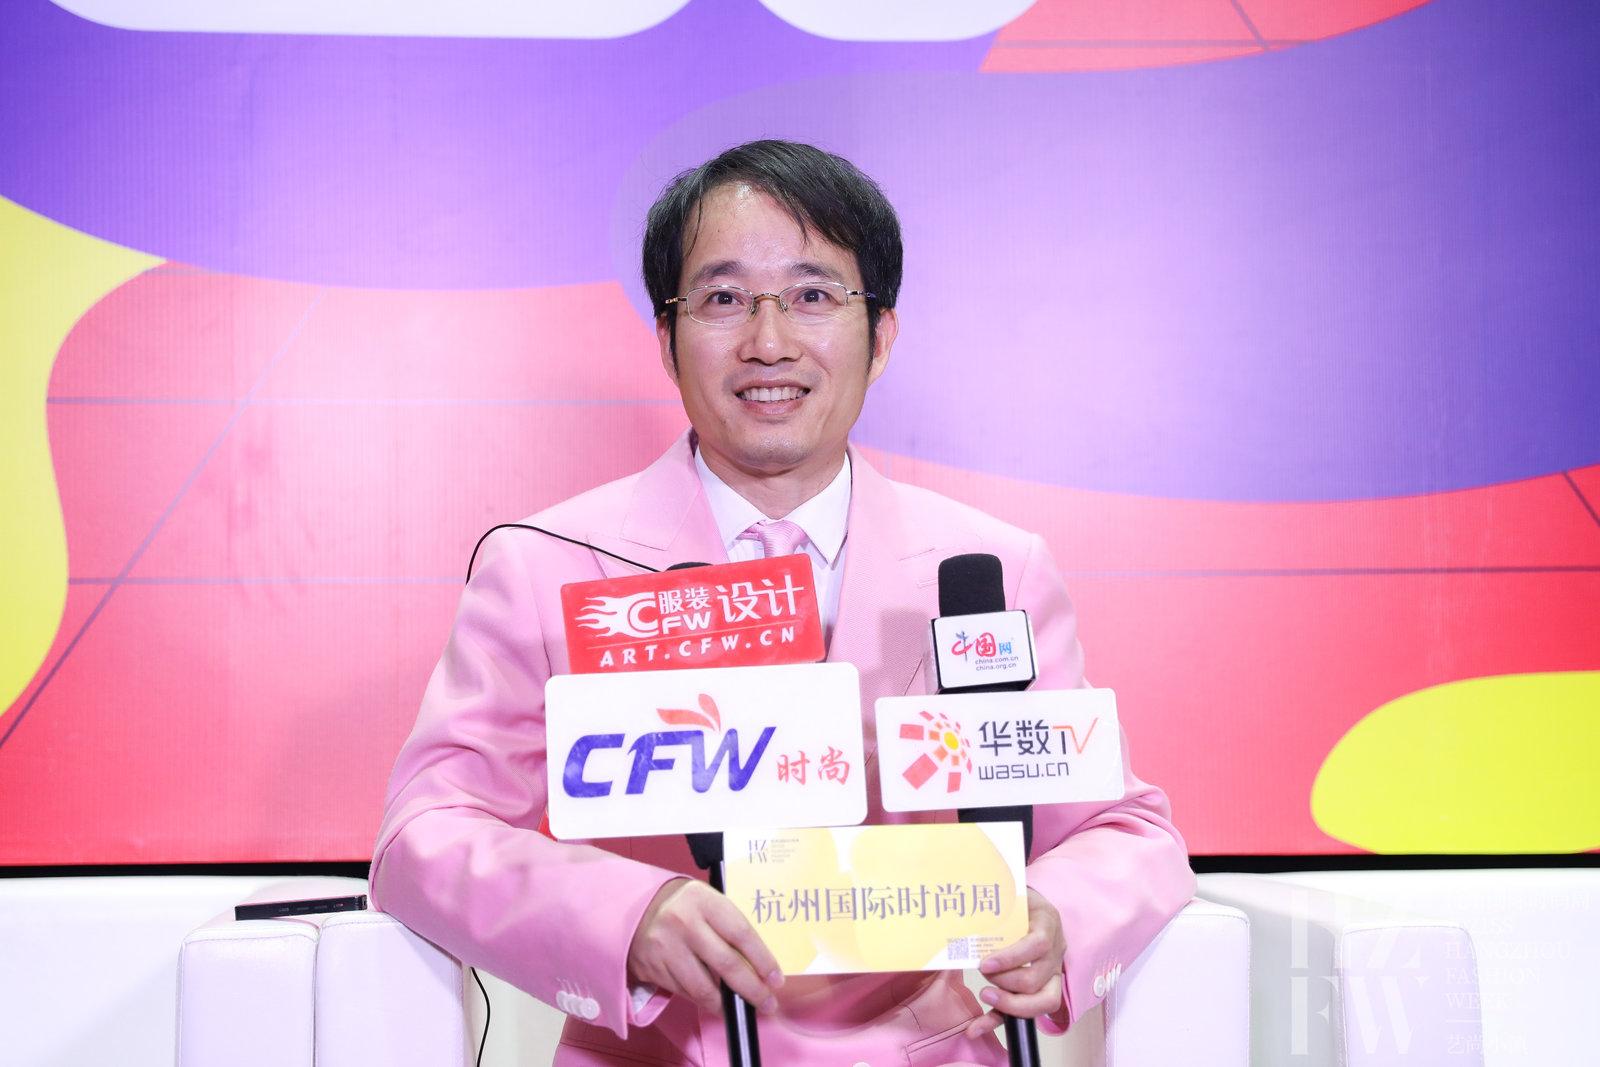 2021ss杭州国际时尚周 | CFW时尚专访共赢会服装源头供应链春夏发布会